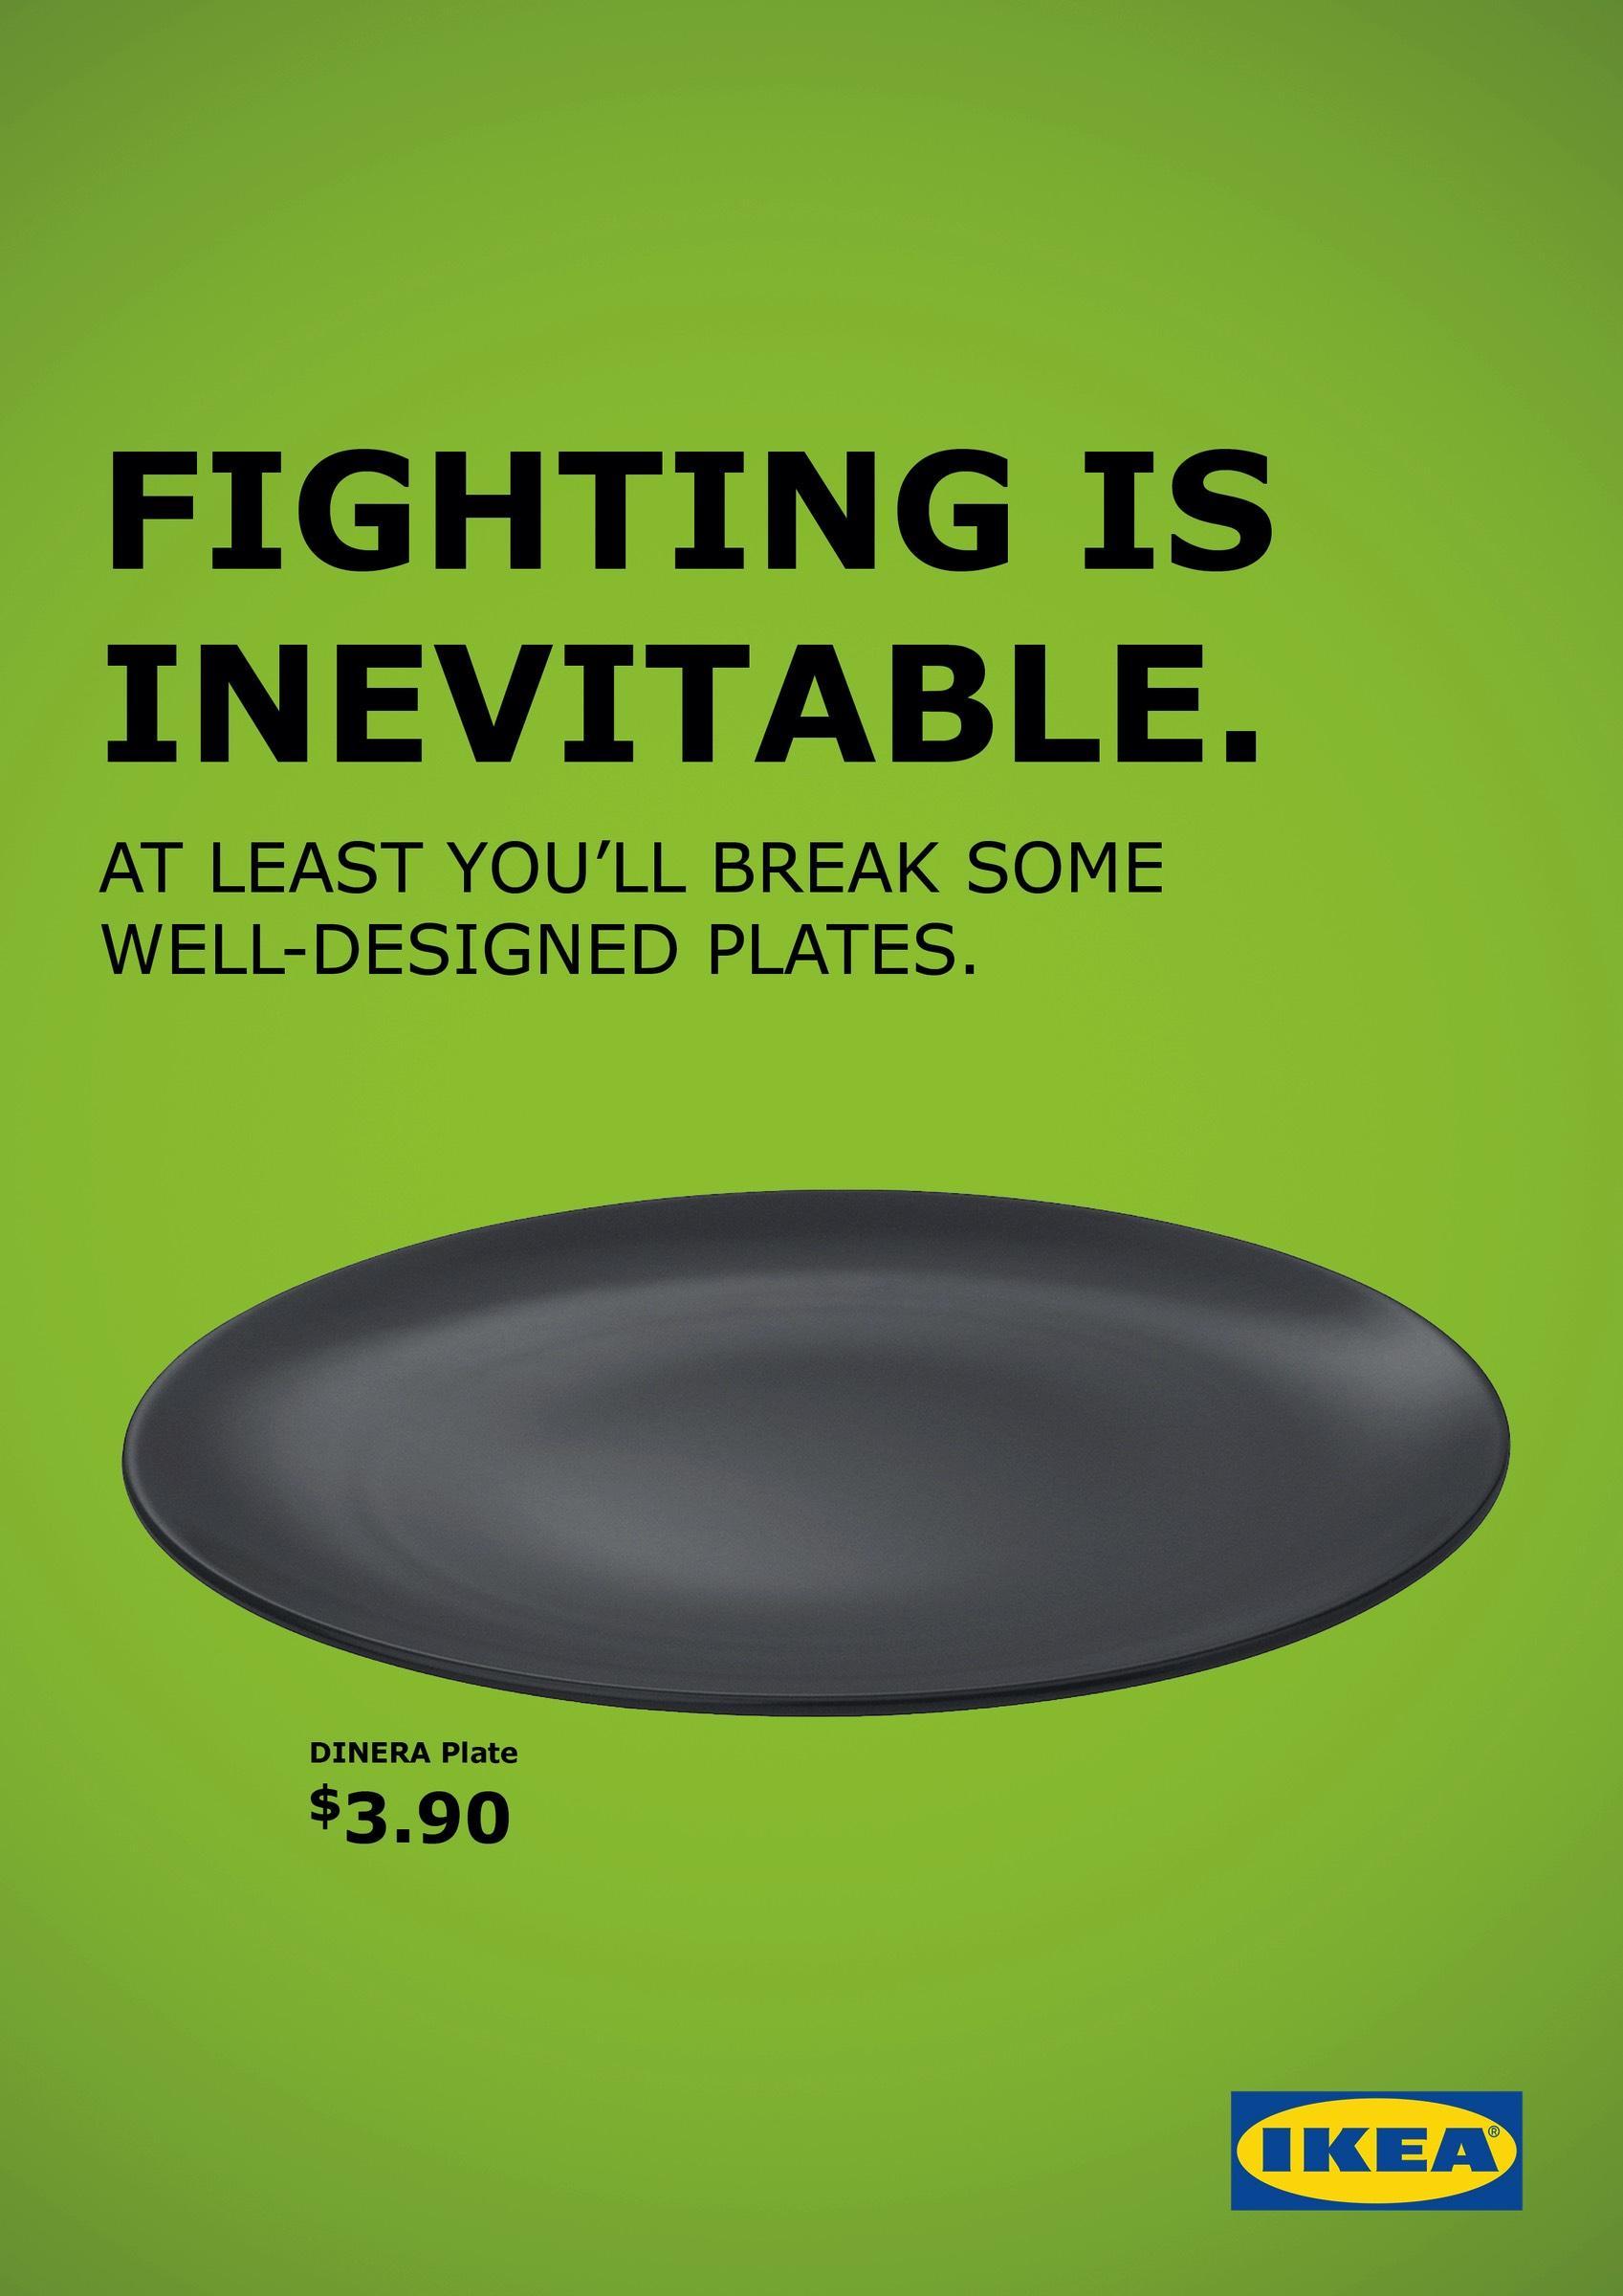 Campanie Ikea - «Fighting is inevitable»